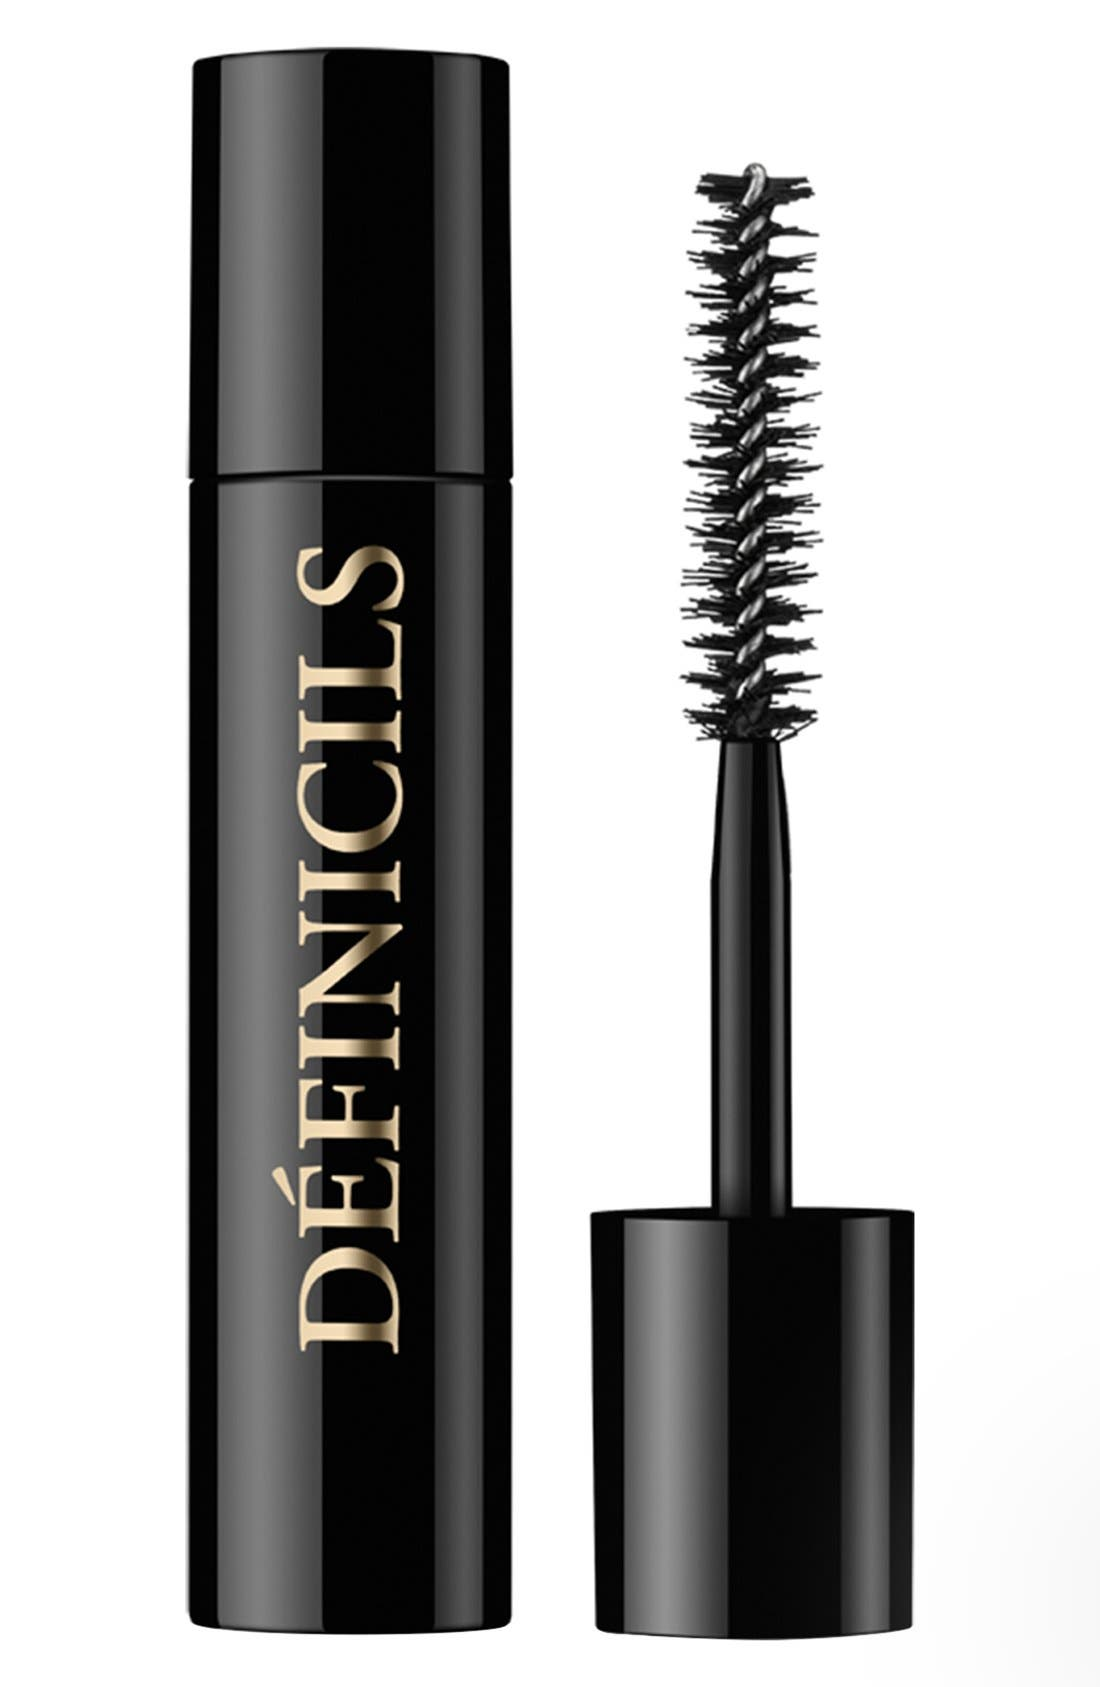 Lancôme Définicils High Definition Mascara Mini (0.07 oz.)